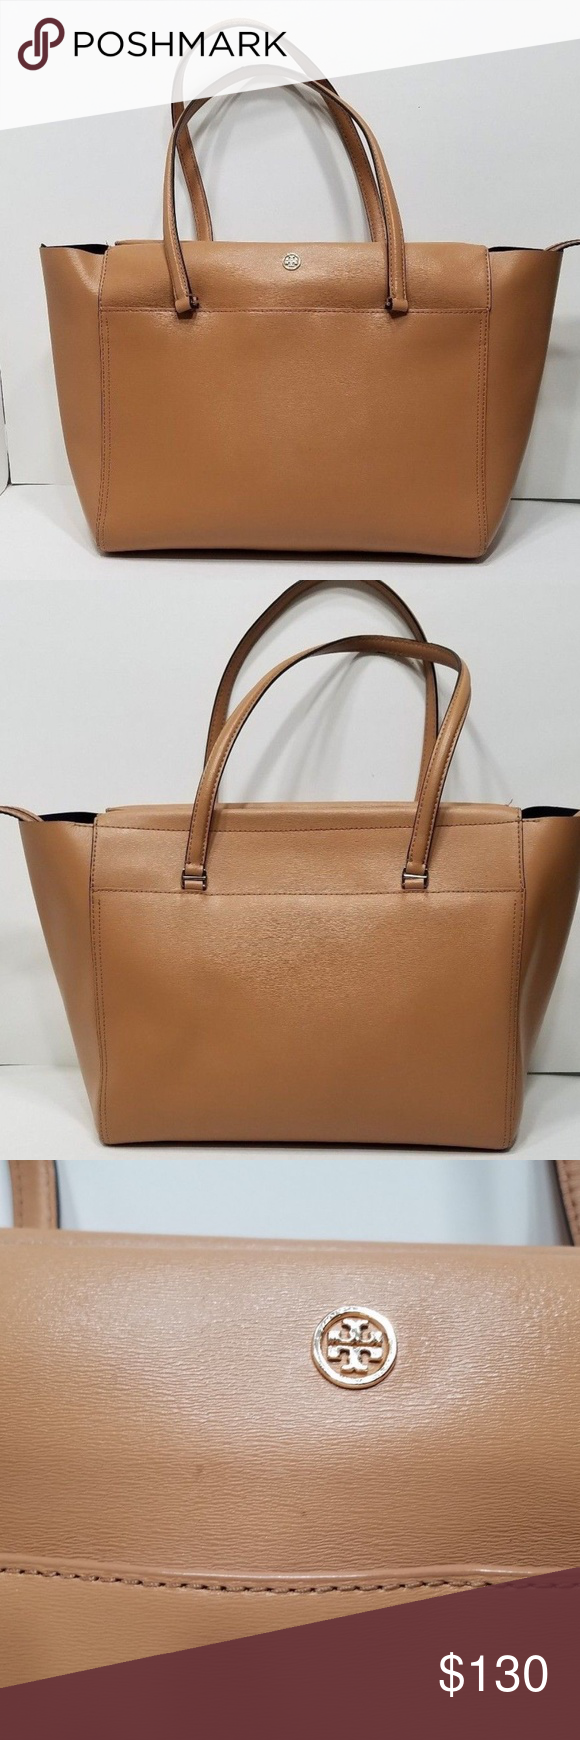 Tory Burch Parker Tote Handbag Purse Saffiano Leather